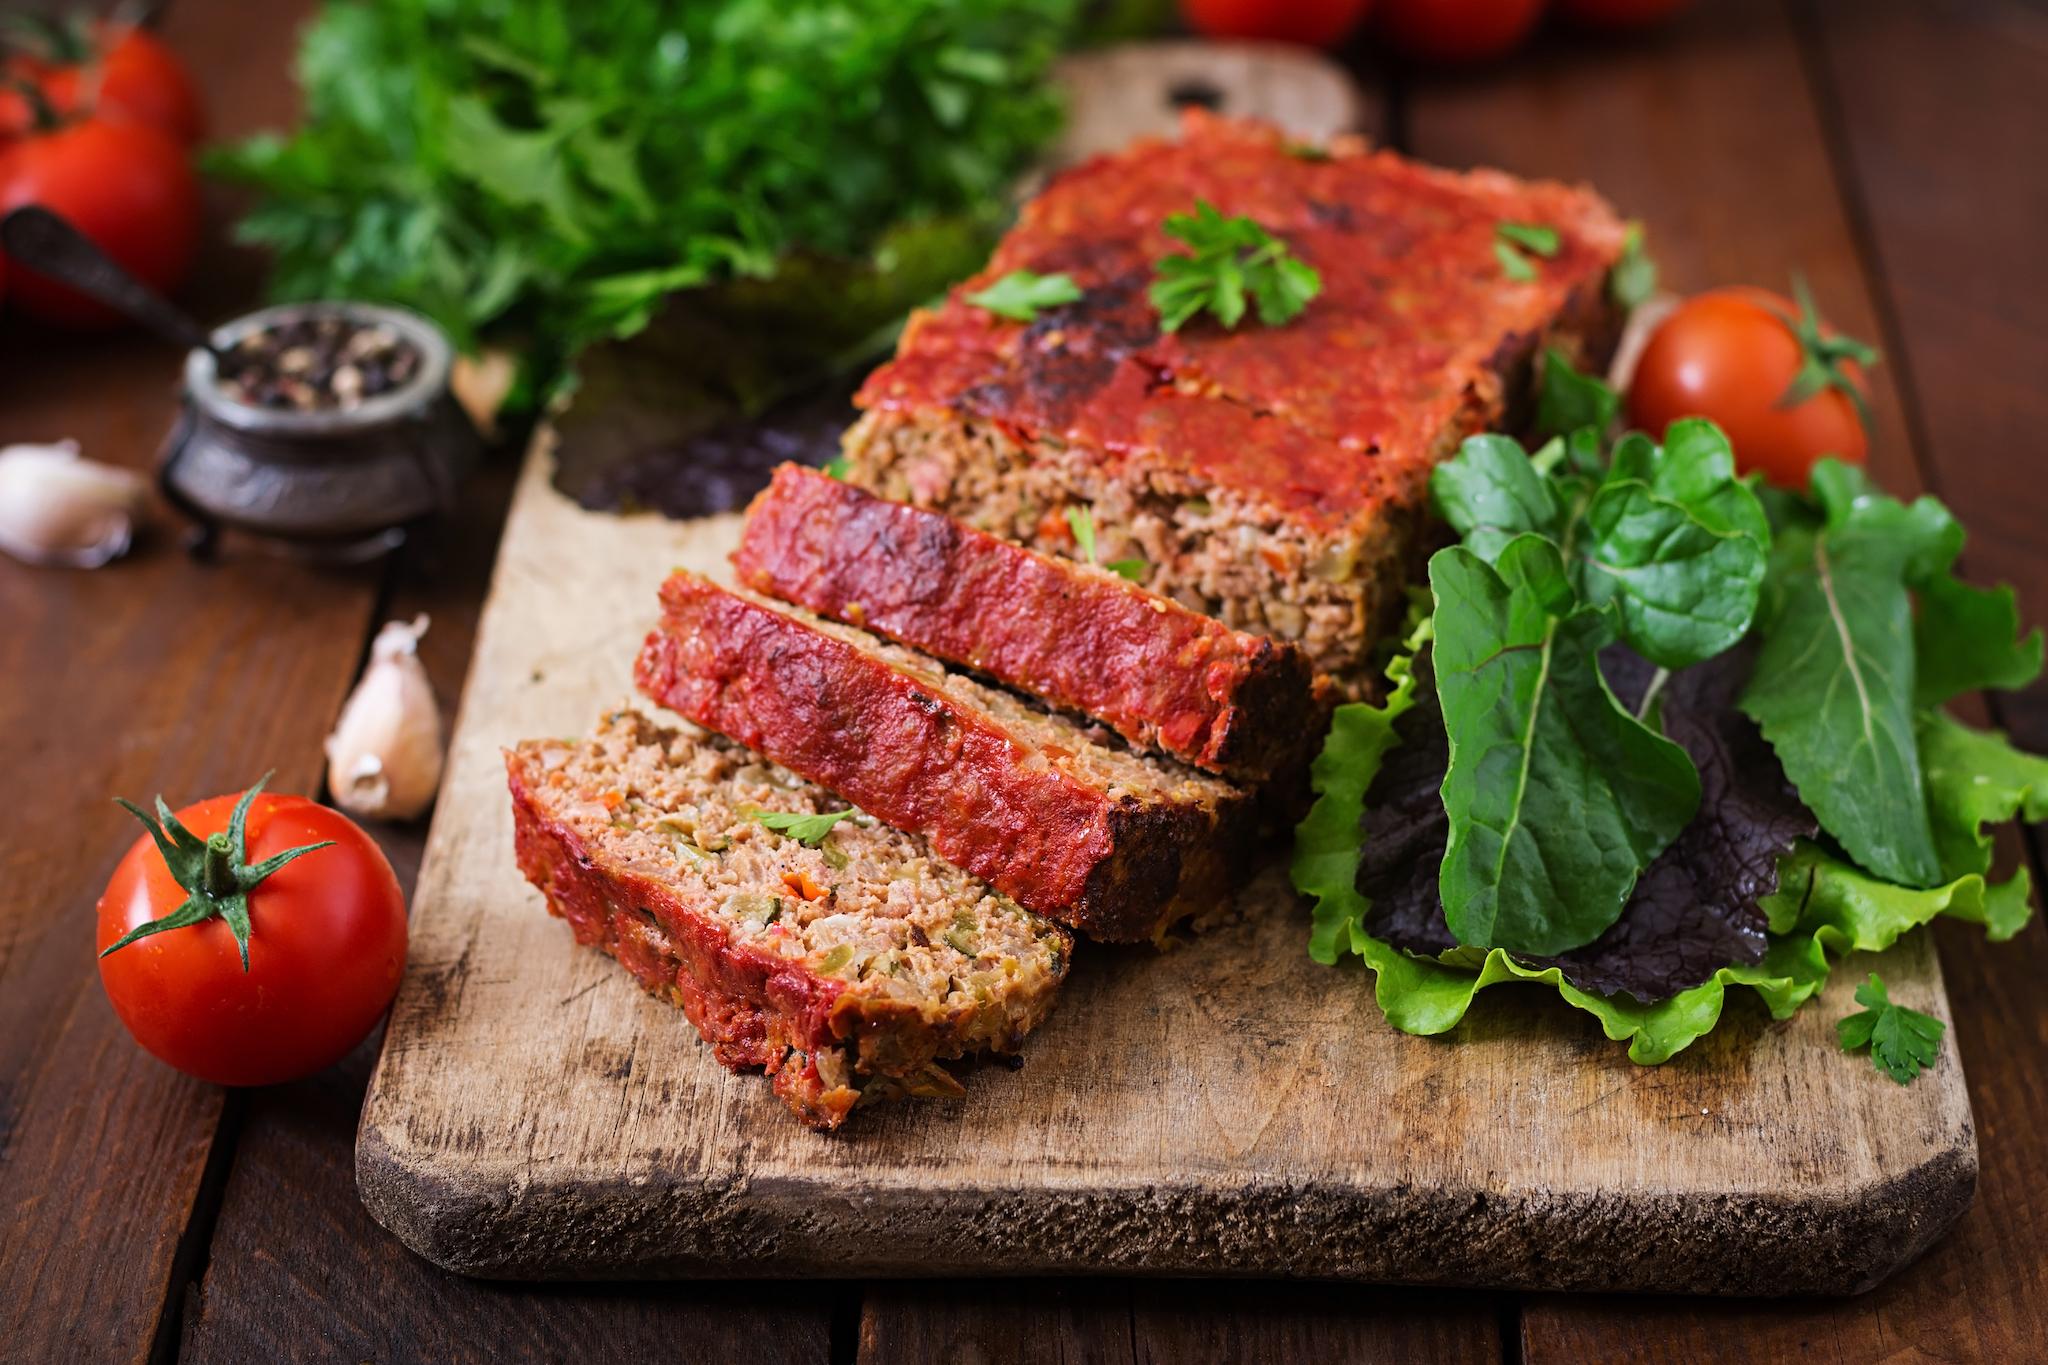 homemade-ground-meatloaf-with-vegetables.jpg